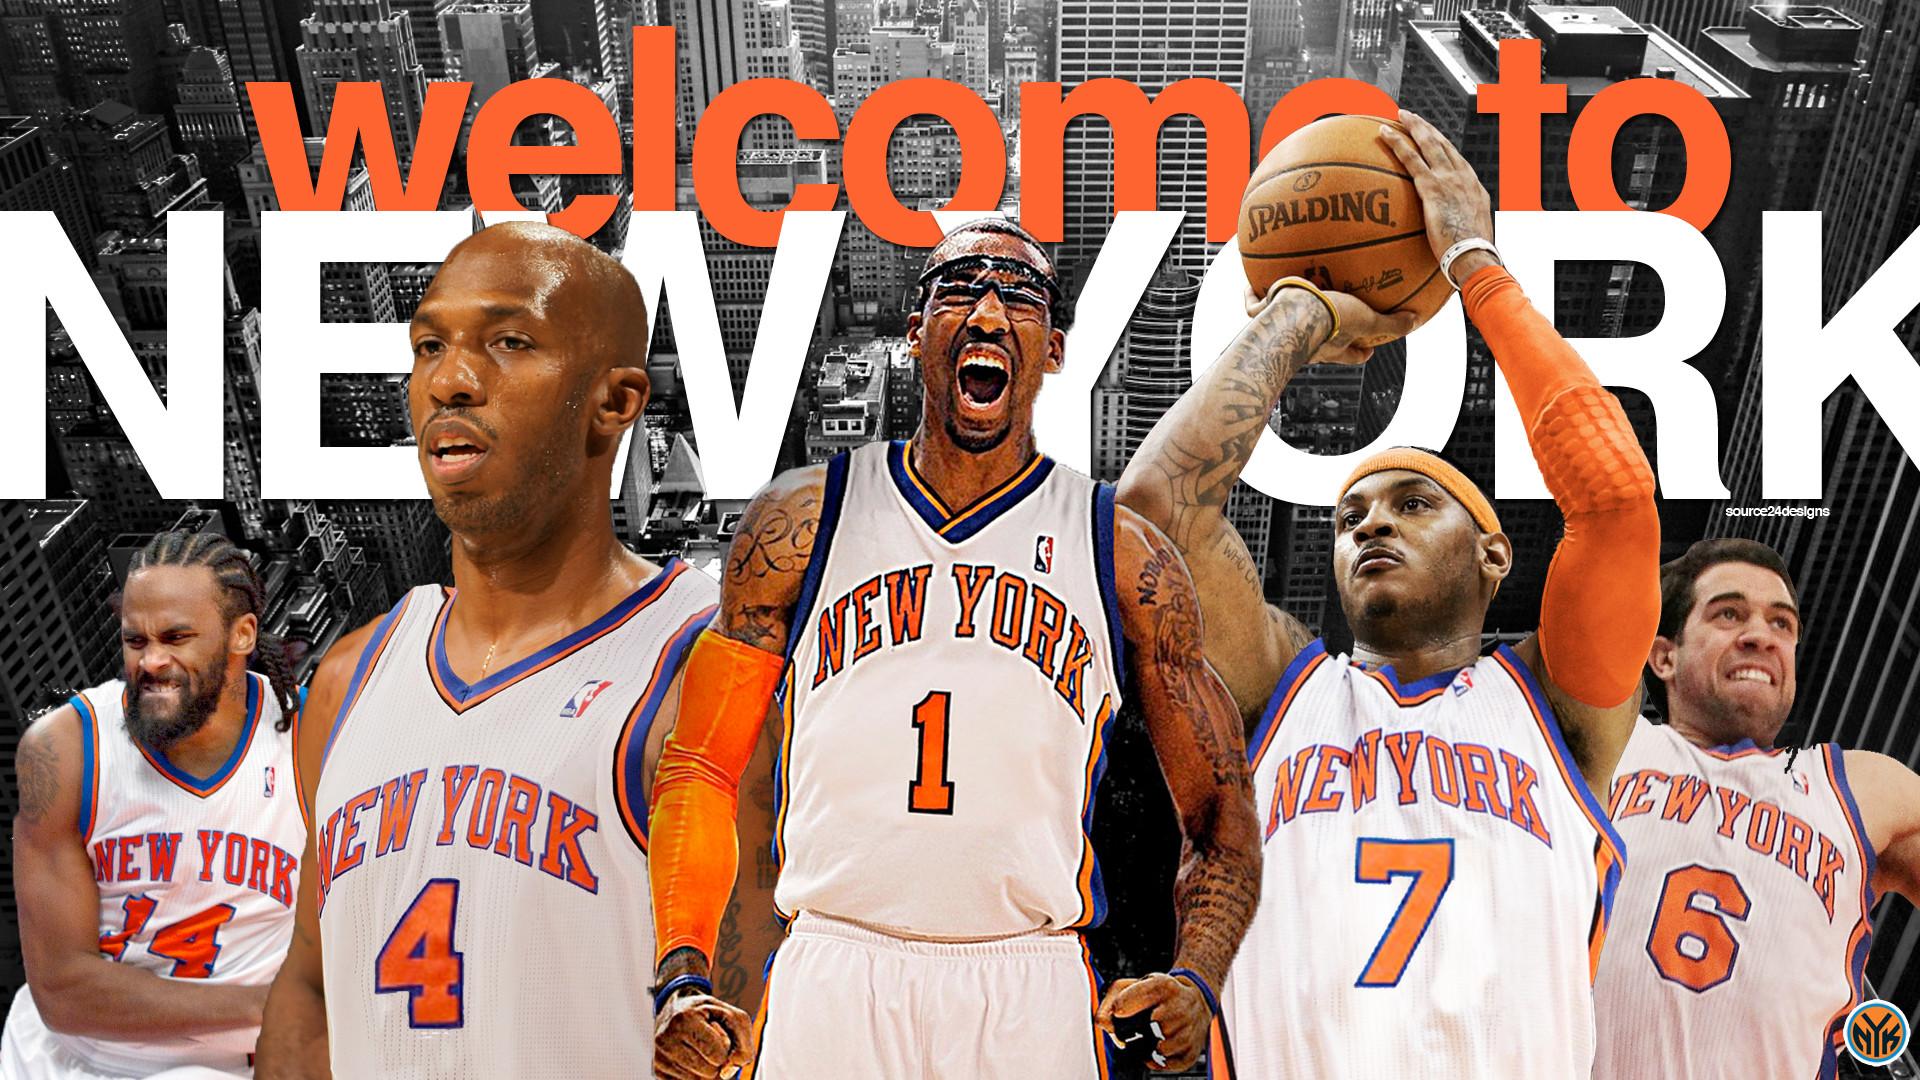 NBA Team New York Knicks Logo Dark Background HD